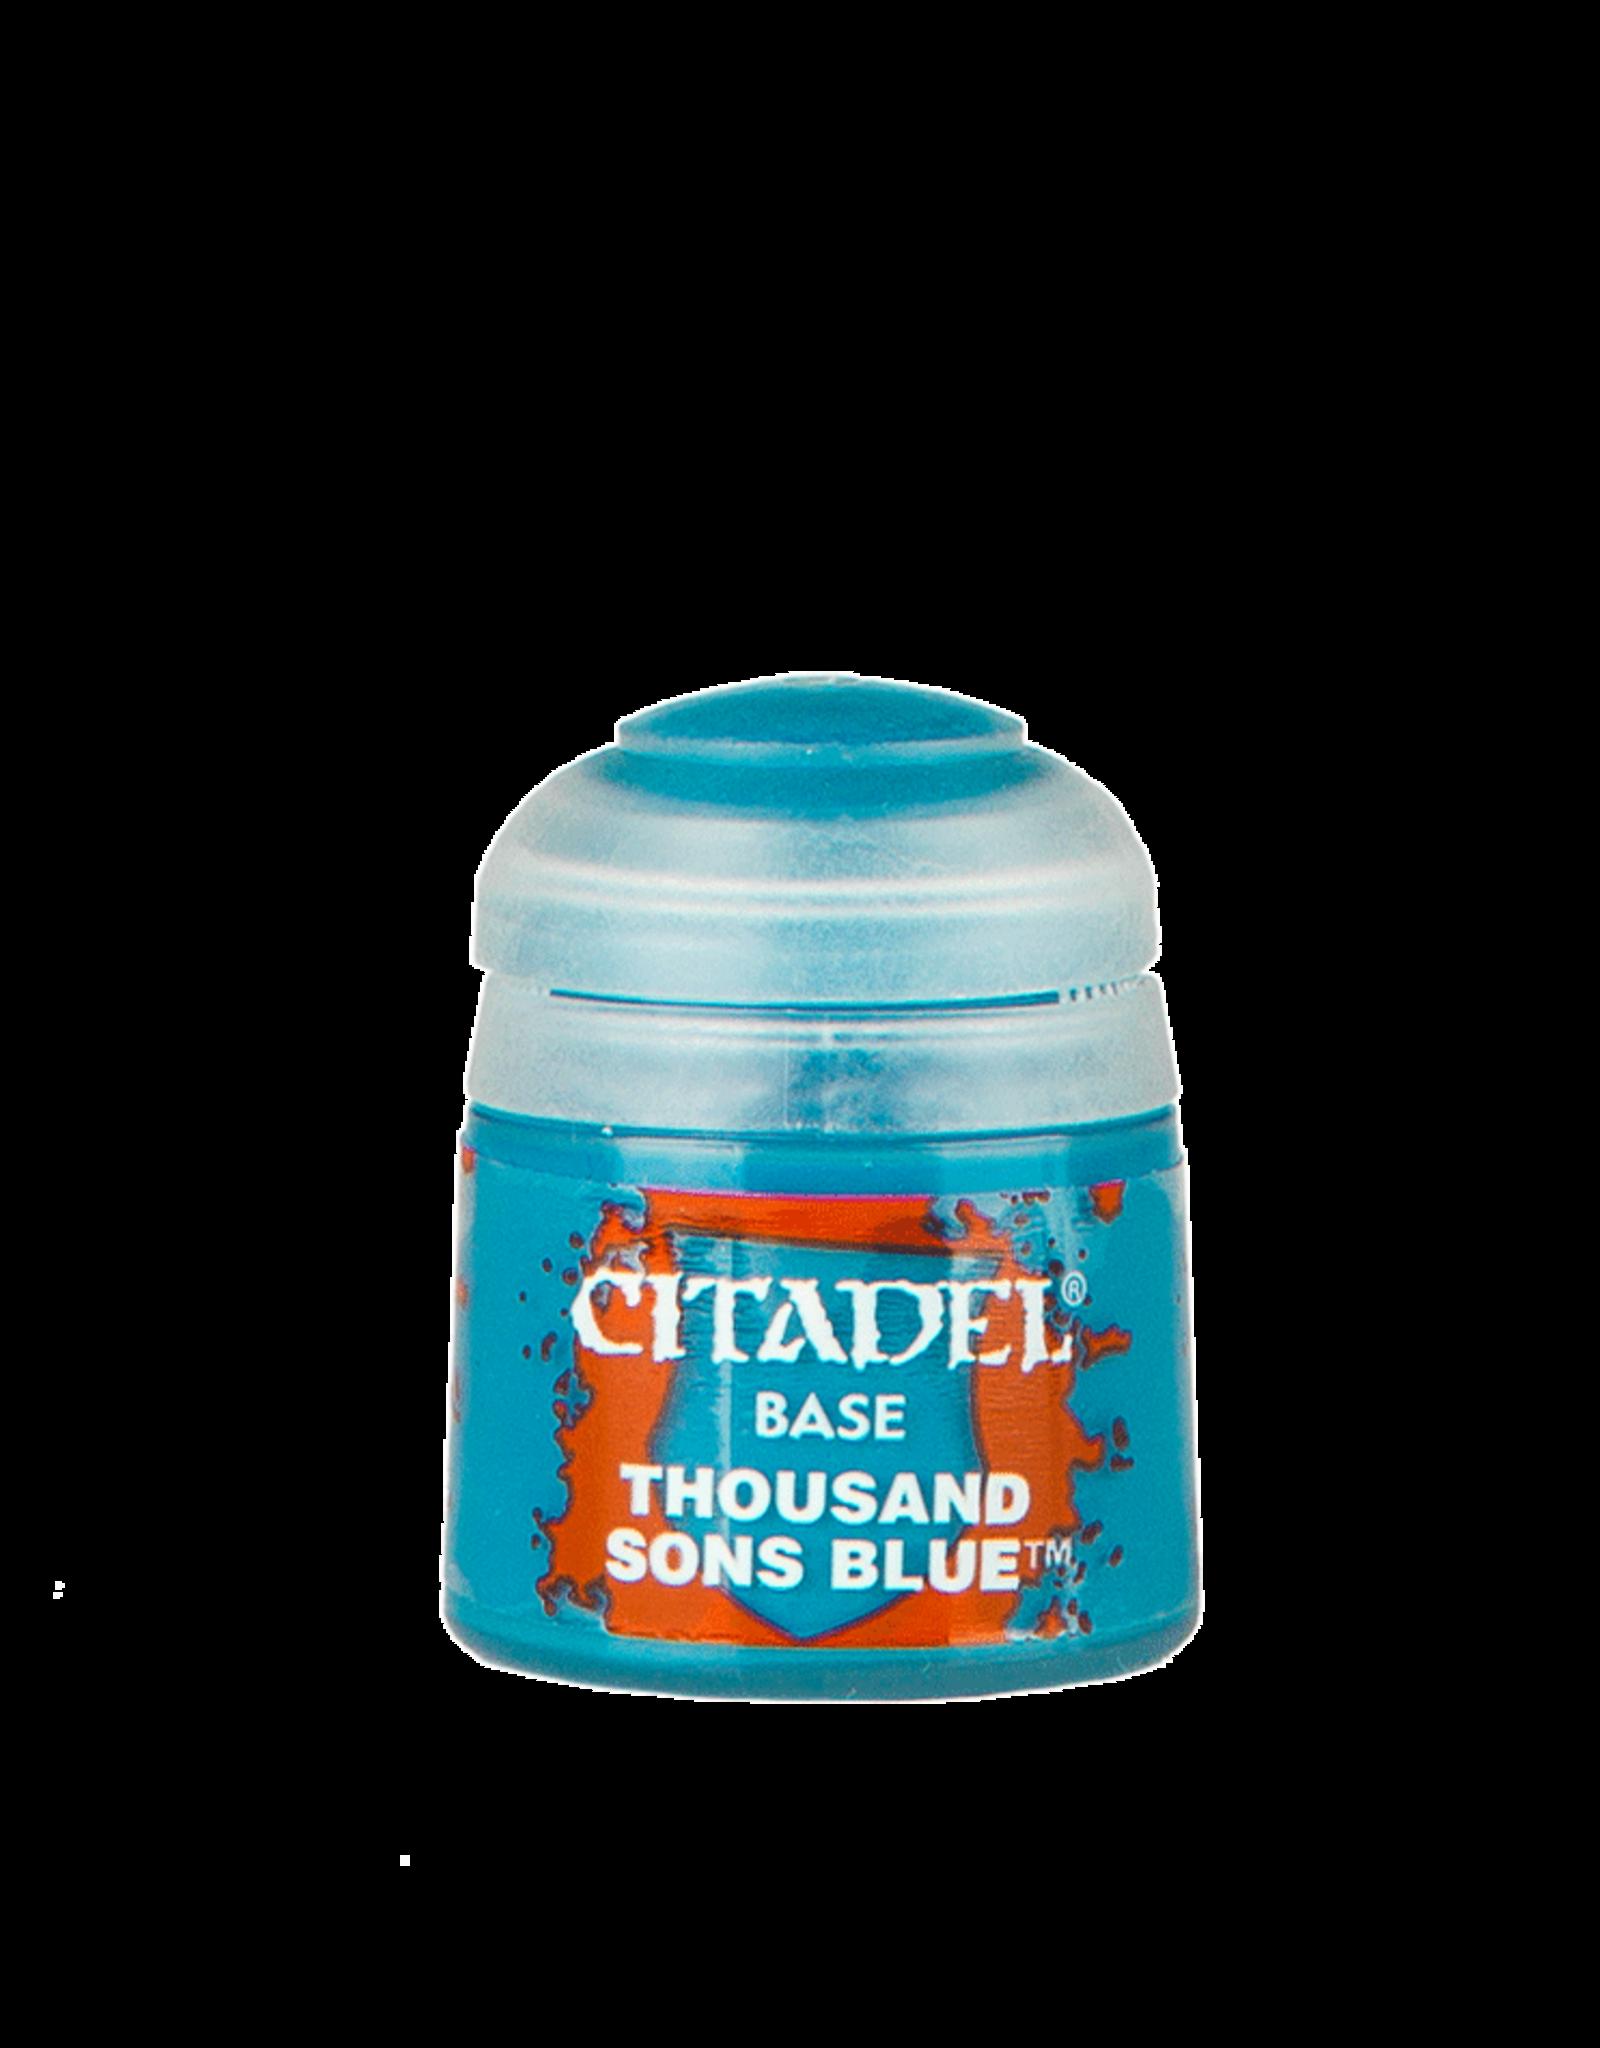 Citadel Citadel Base: Thousand Sons Blue (12ml)